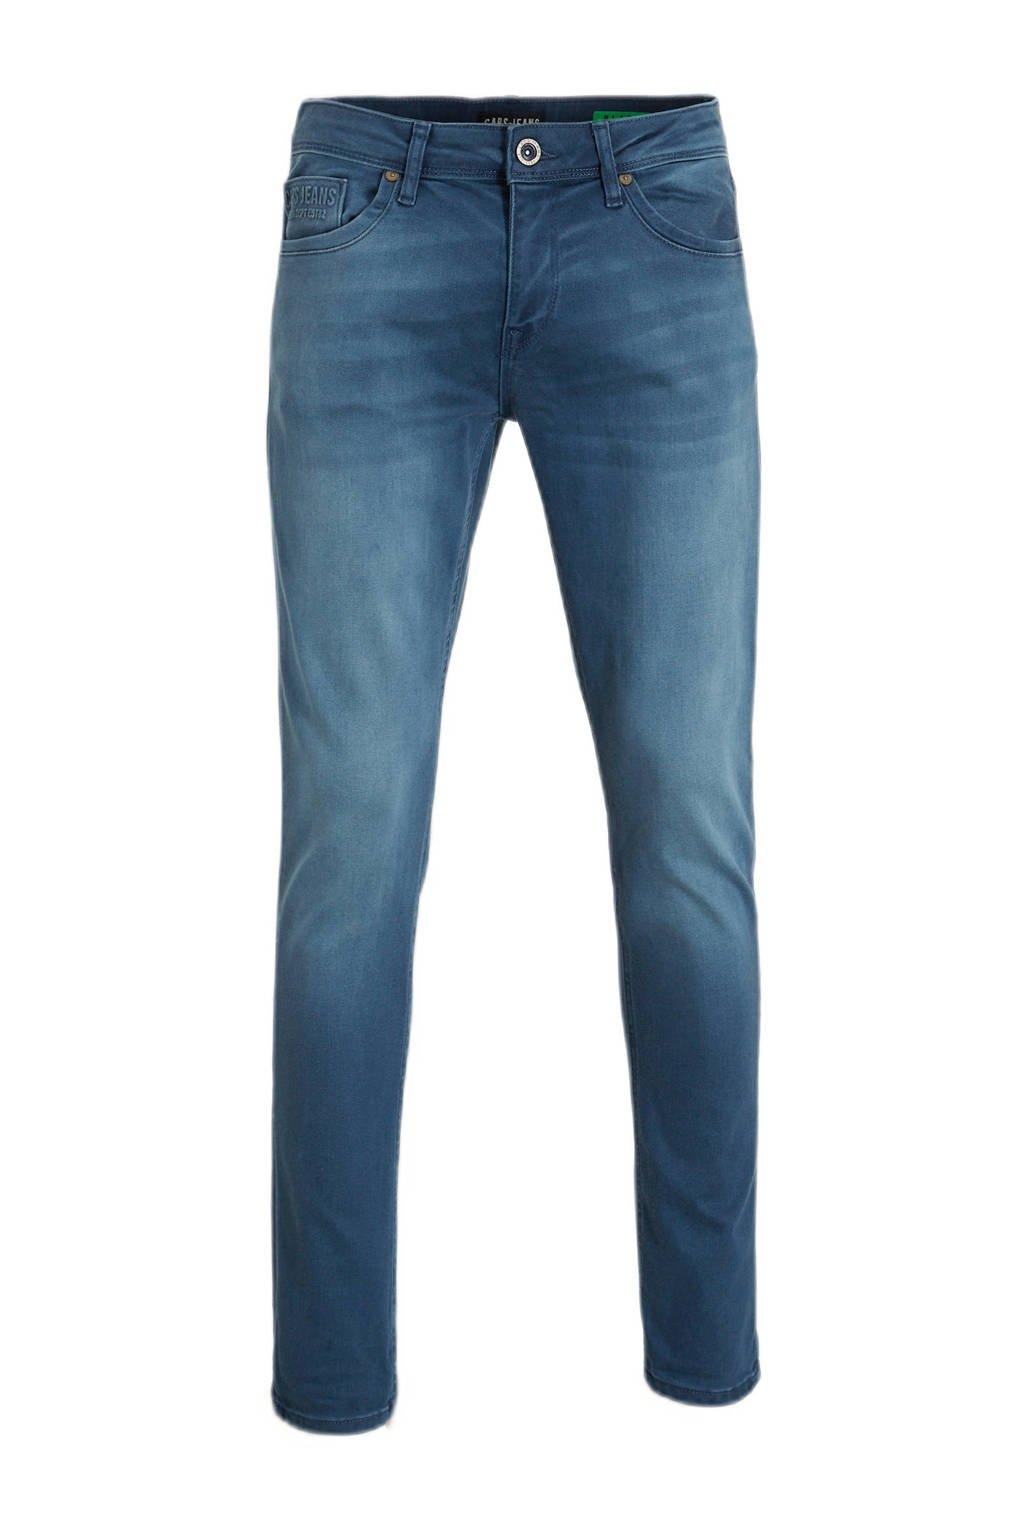 Cars slim fit jeans Blast dallas blue, Dallas Blue